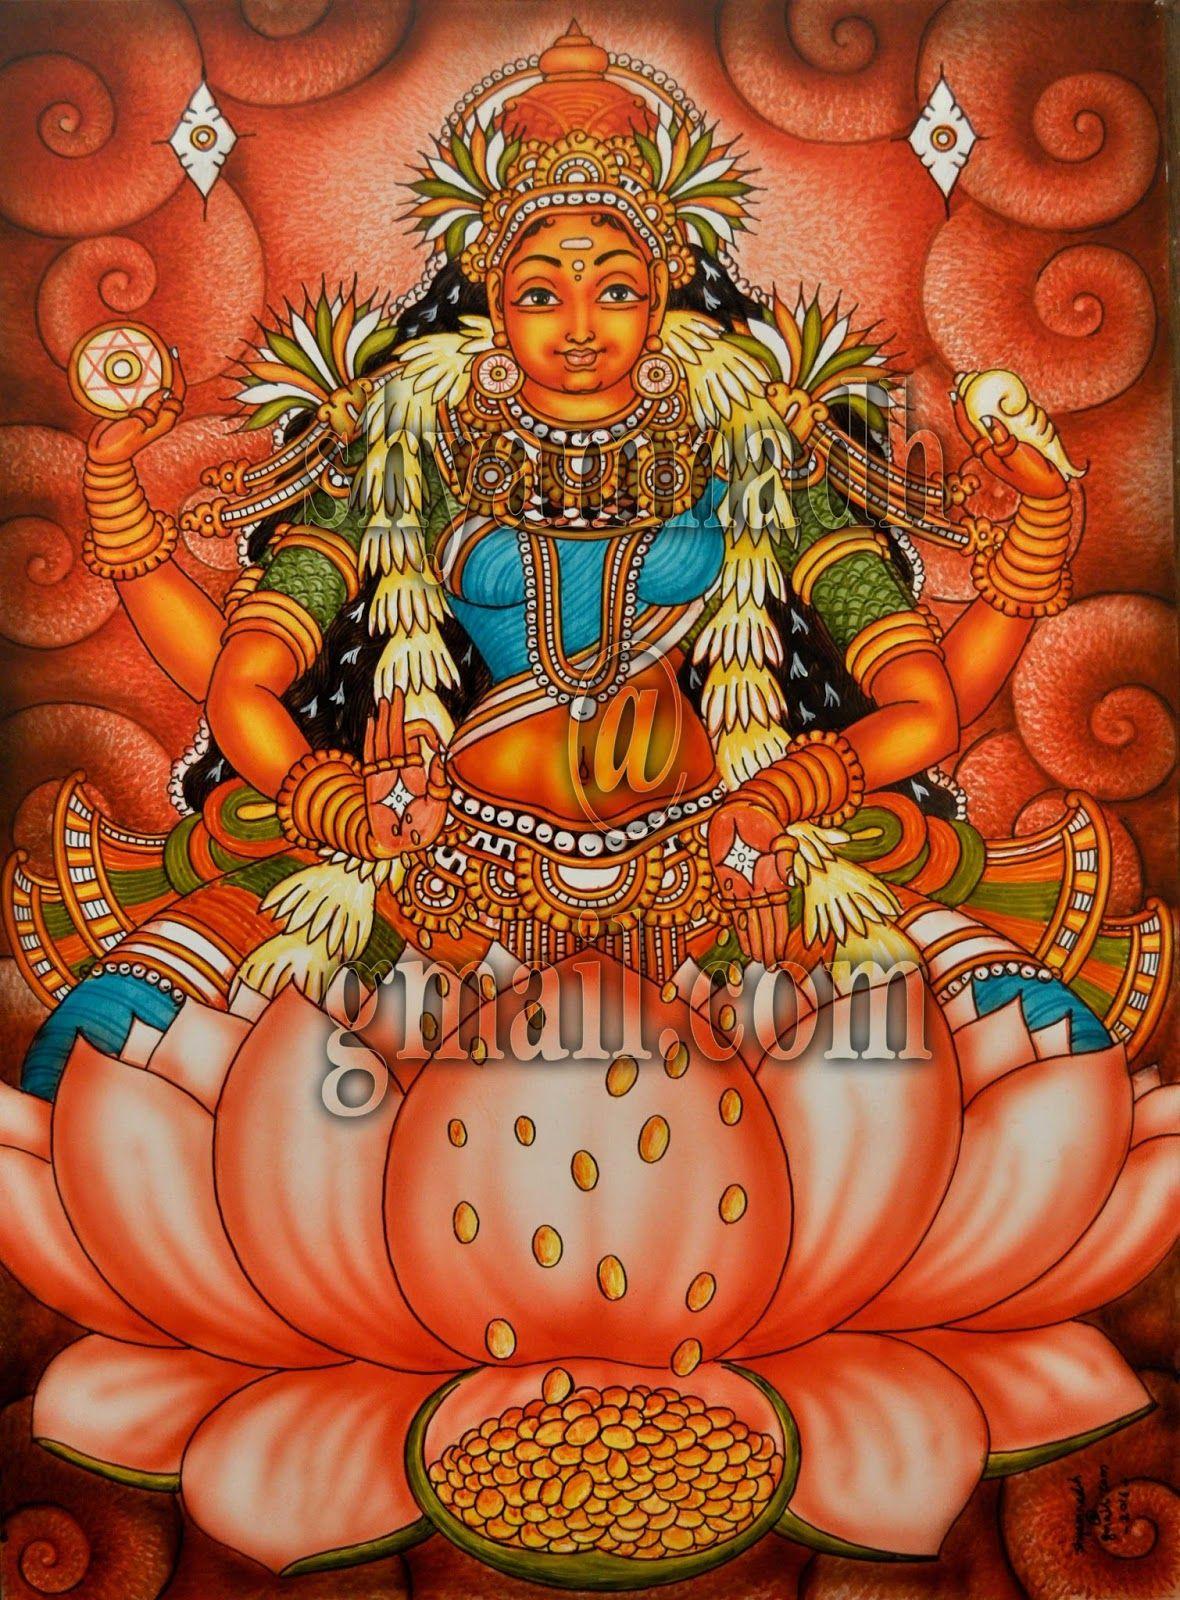 Artist shyamnadh Kerala mural painting, Buddha art